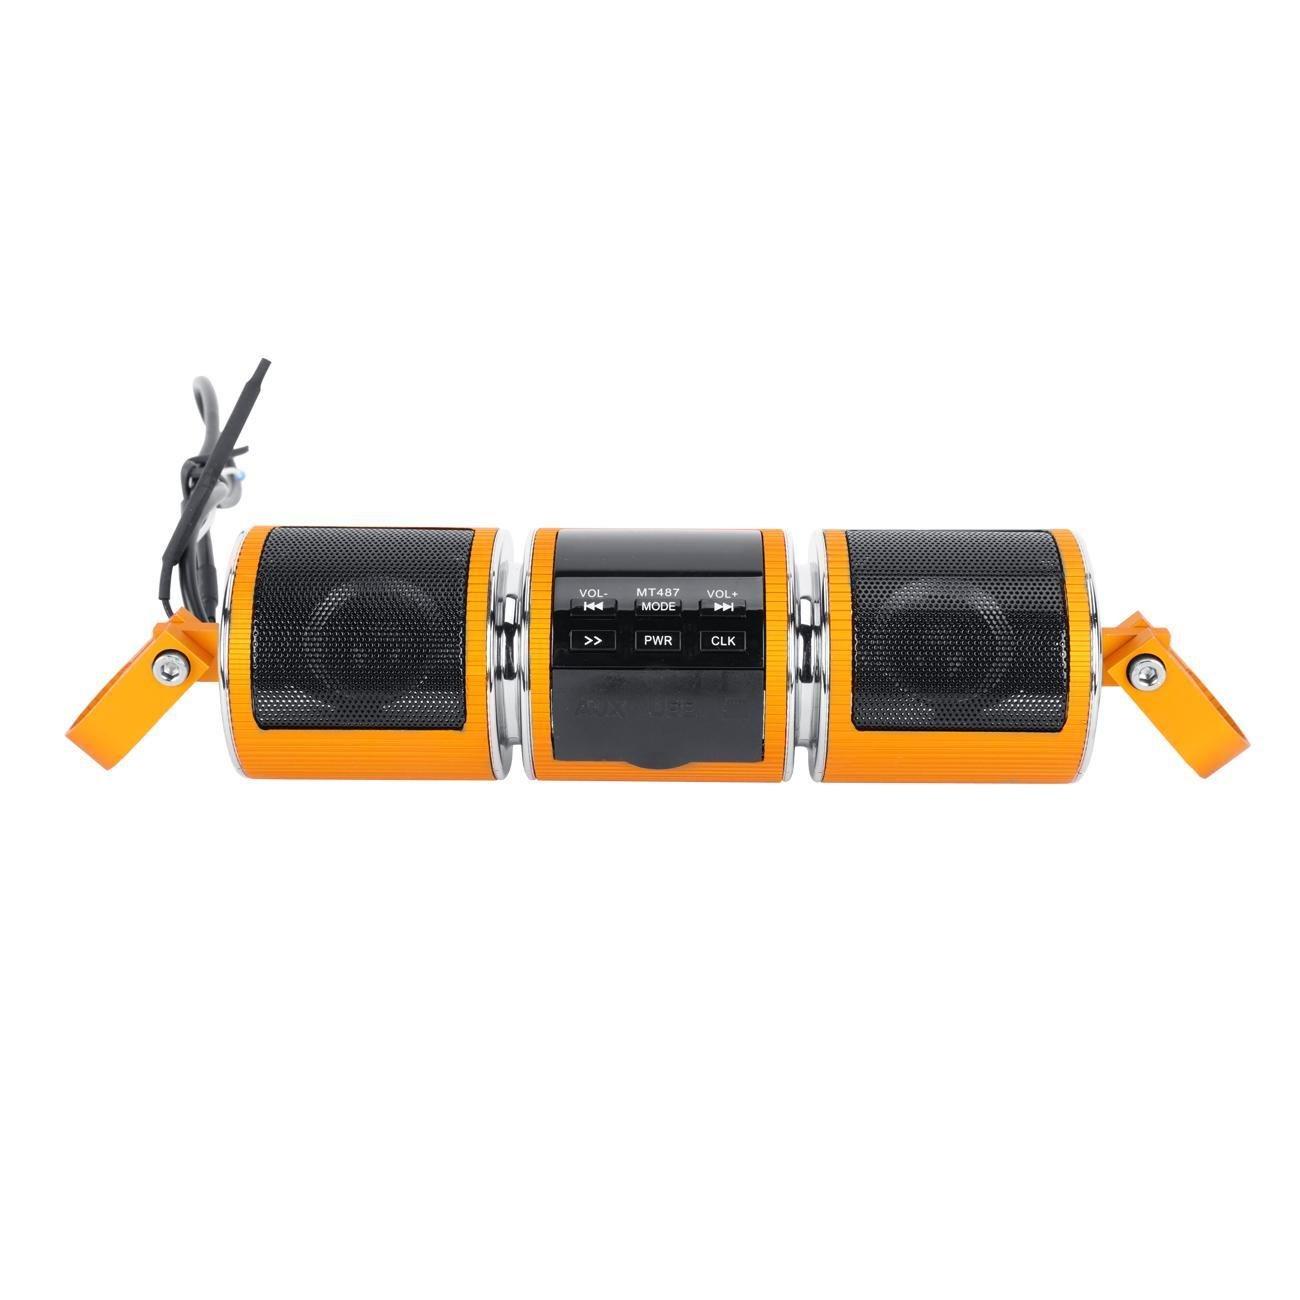 7//8 Handlebar INNOGLOW Motorcycle Bluetooth Speaker Wireless Bluetooth Audio Radio USB FM MP3//WMA Universal fits for any Motorbike with 22mm